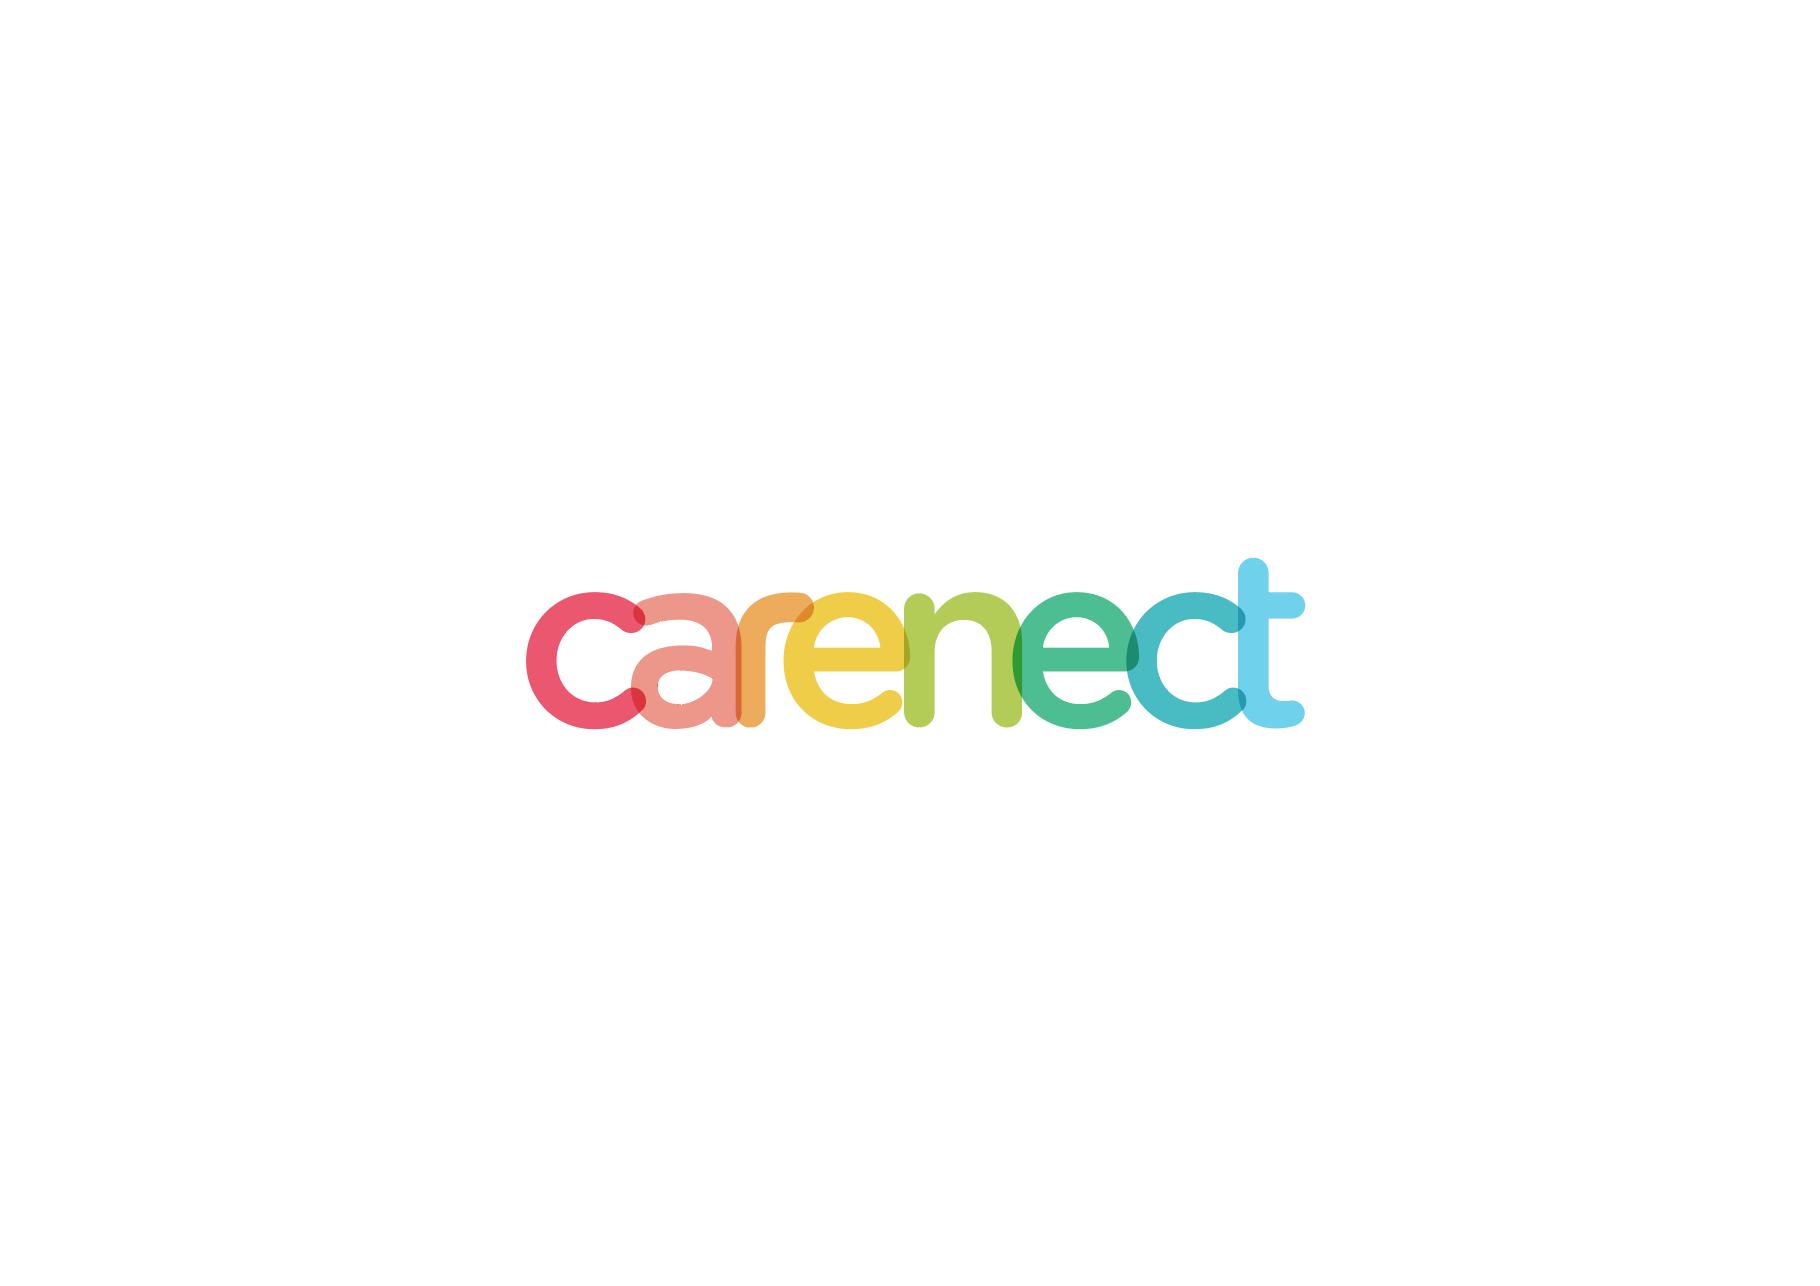 Talia-OBrien-Carenect-logo.png